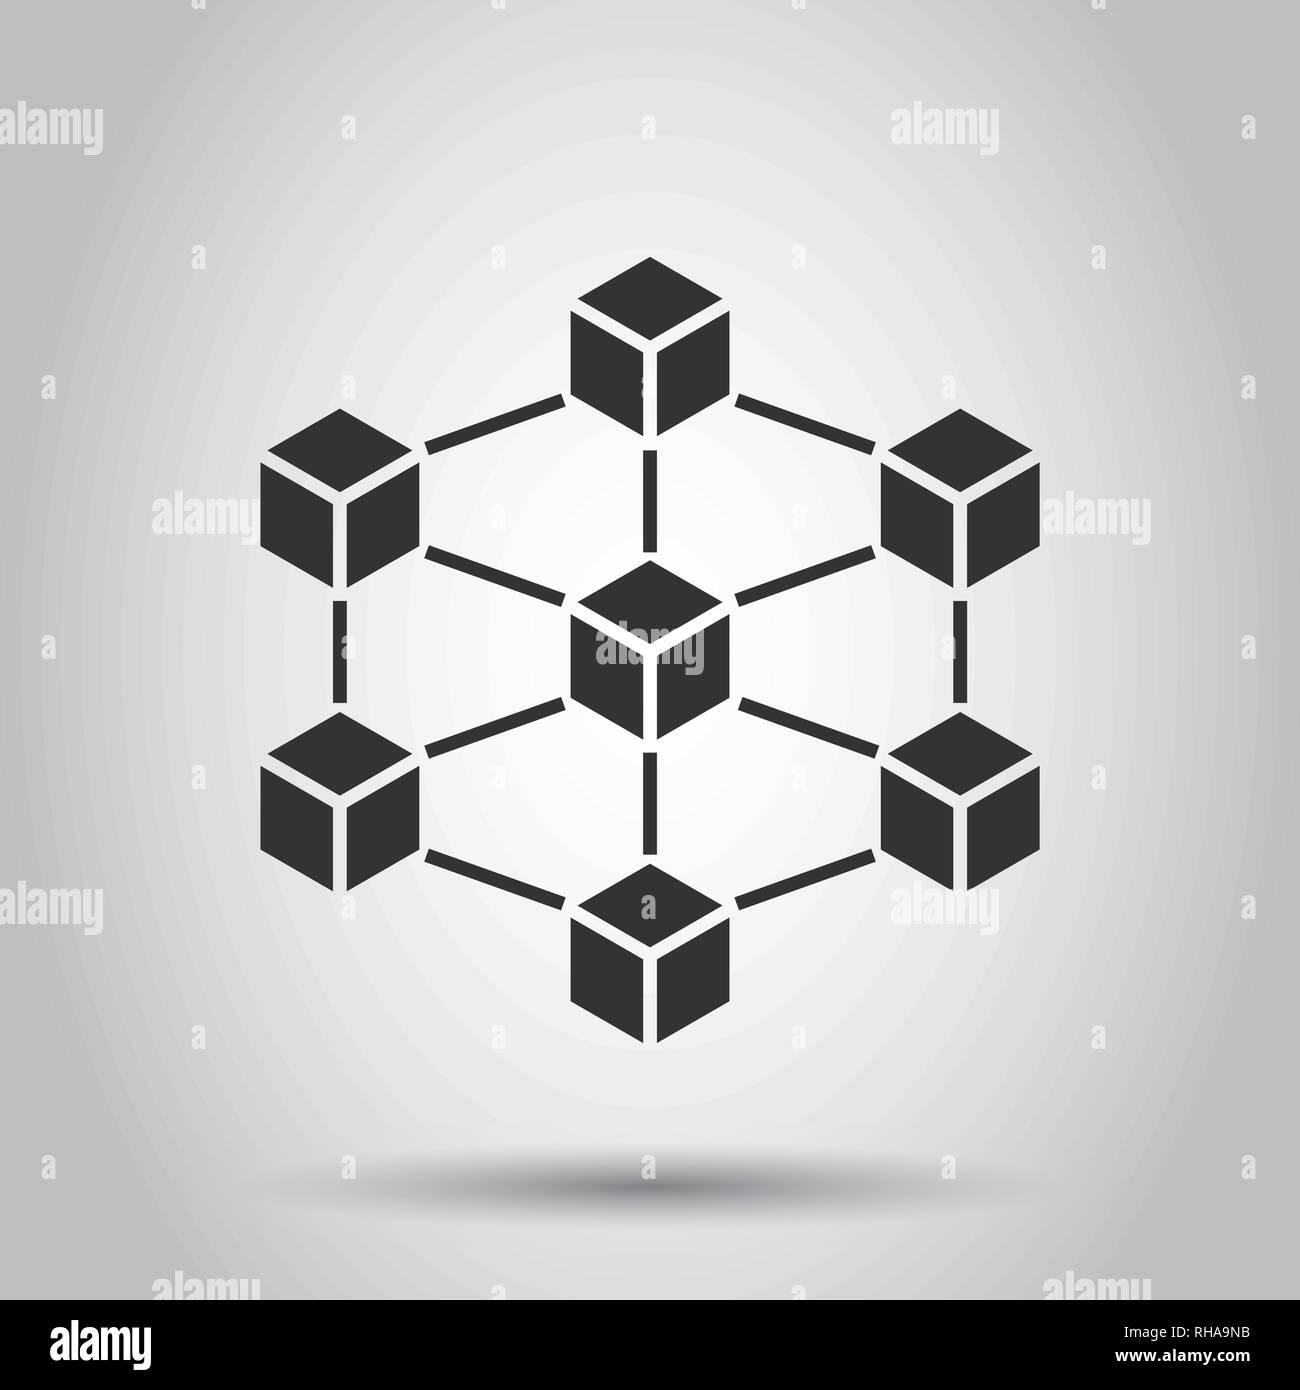 Blockchain technology vector icon in flat style